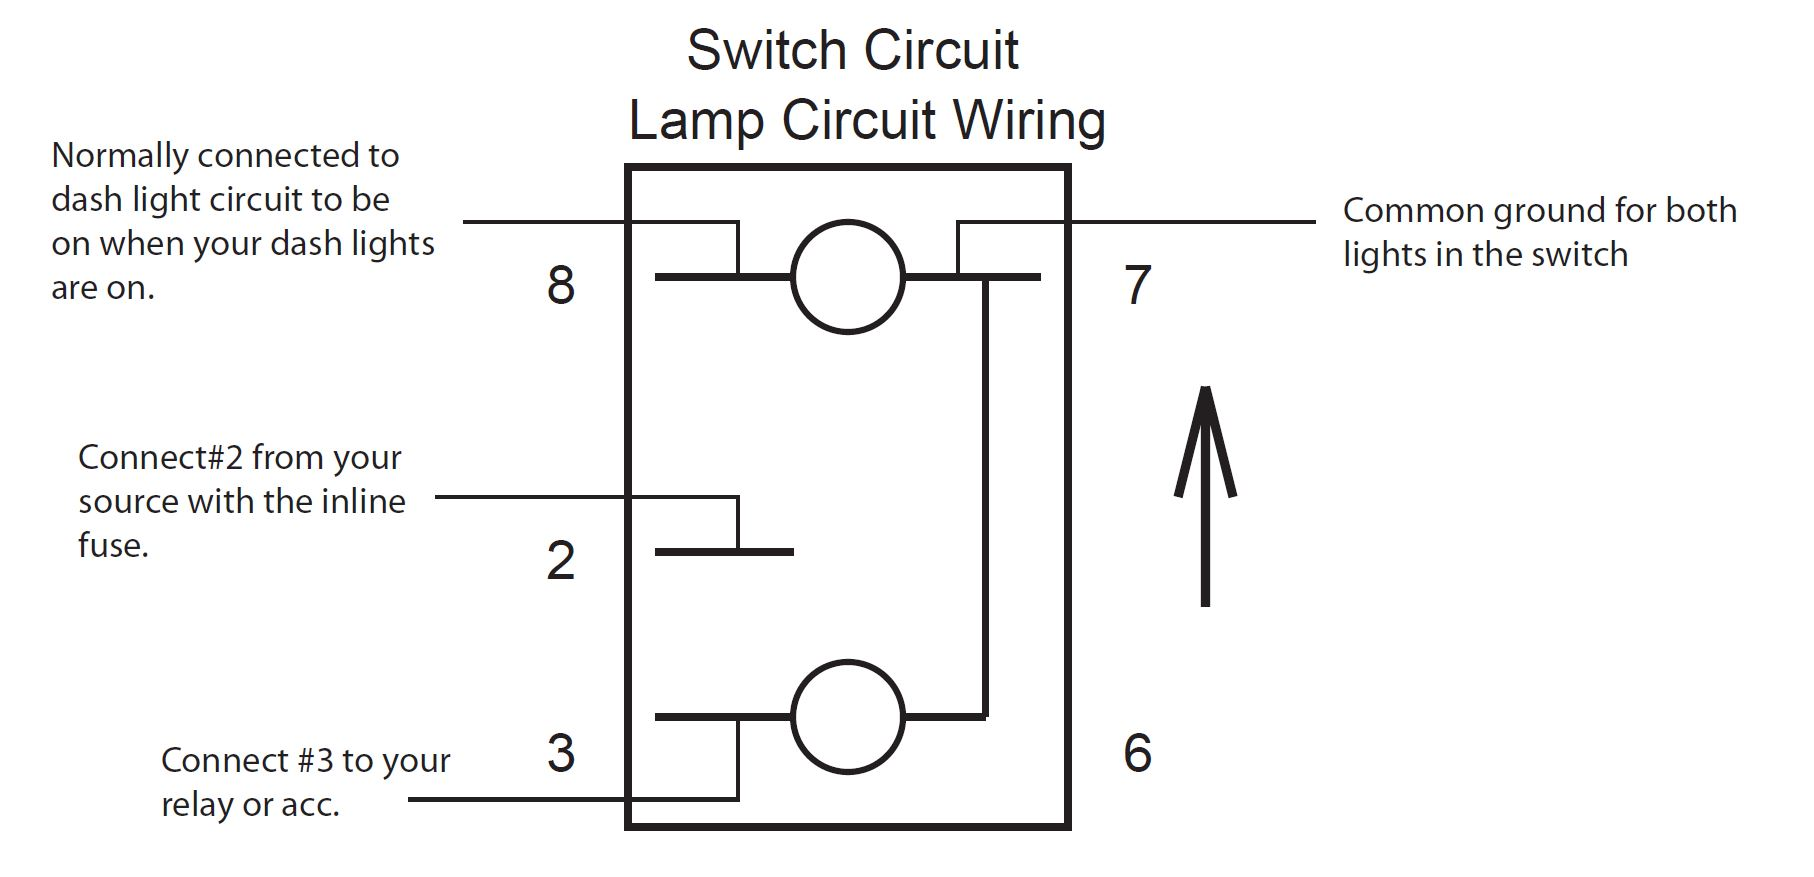 5 Pin Switch Wiring Diagram from www.rzrforums.net